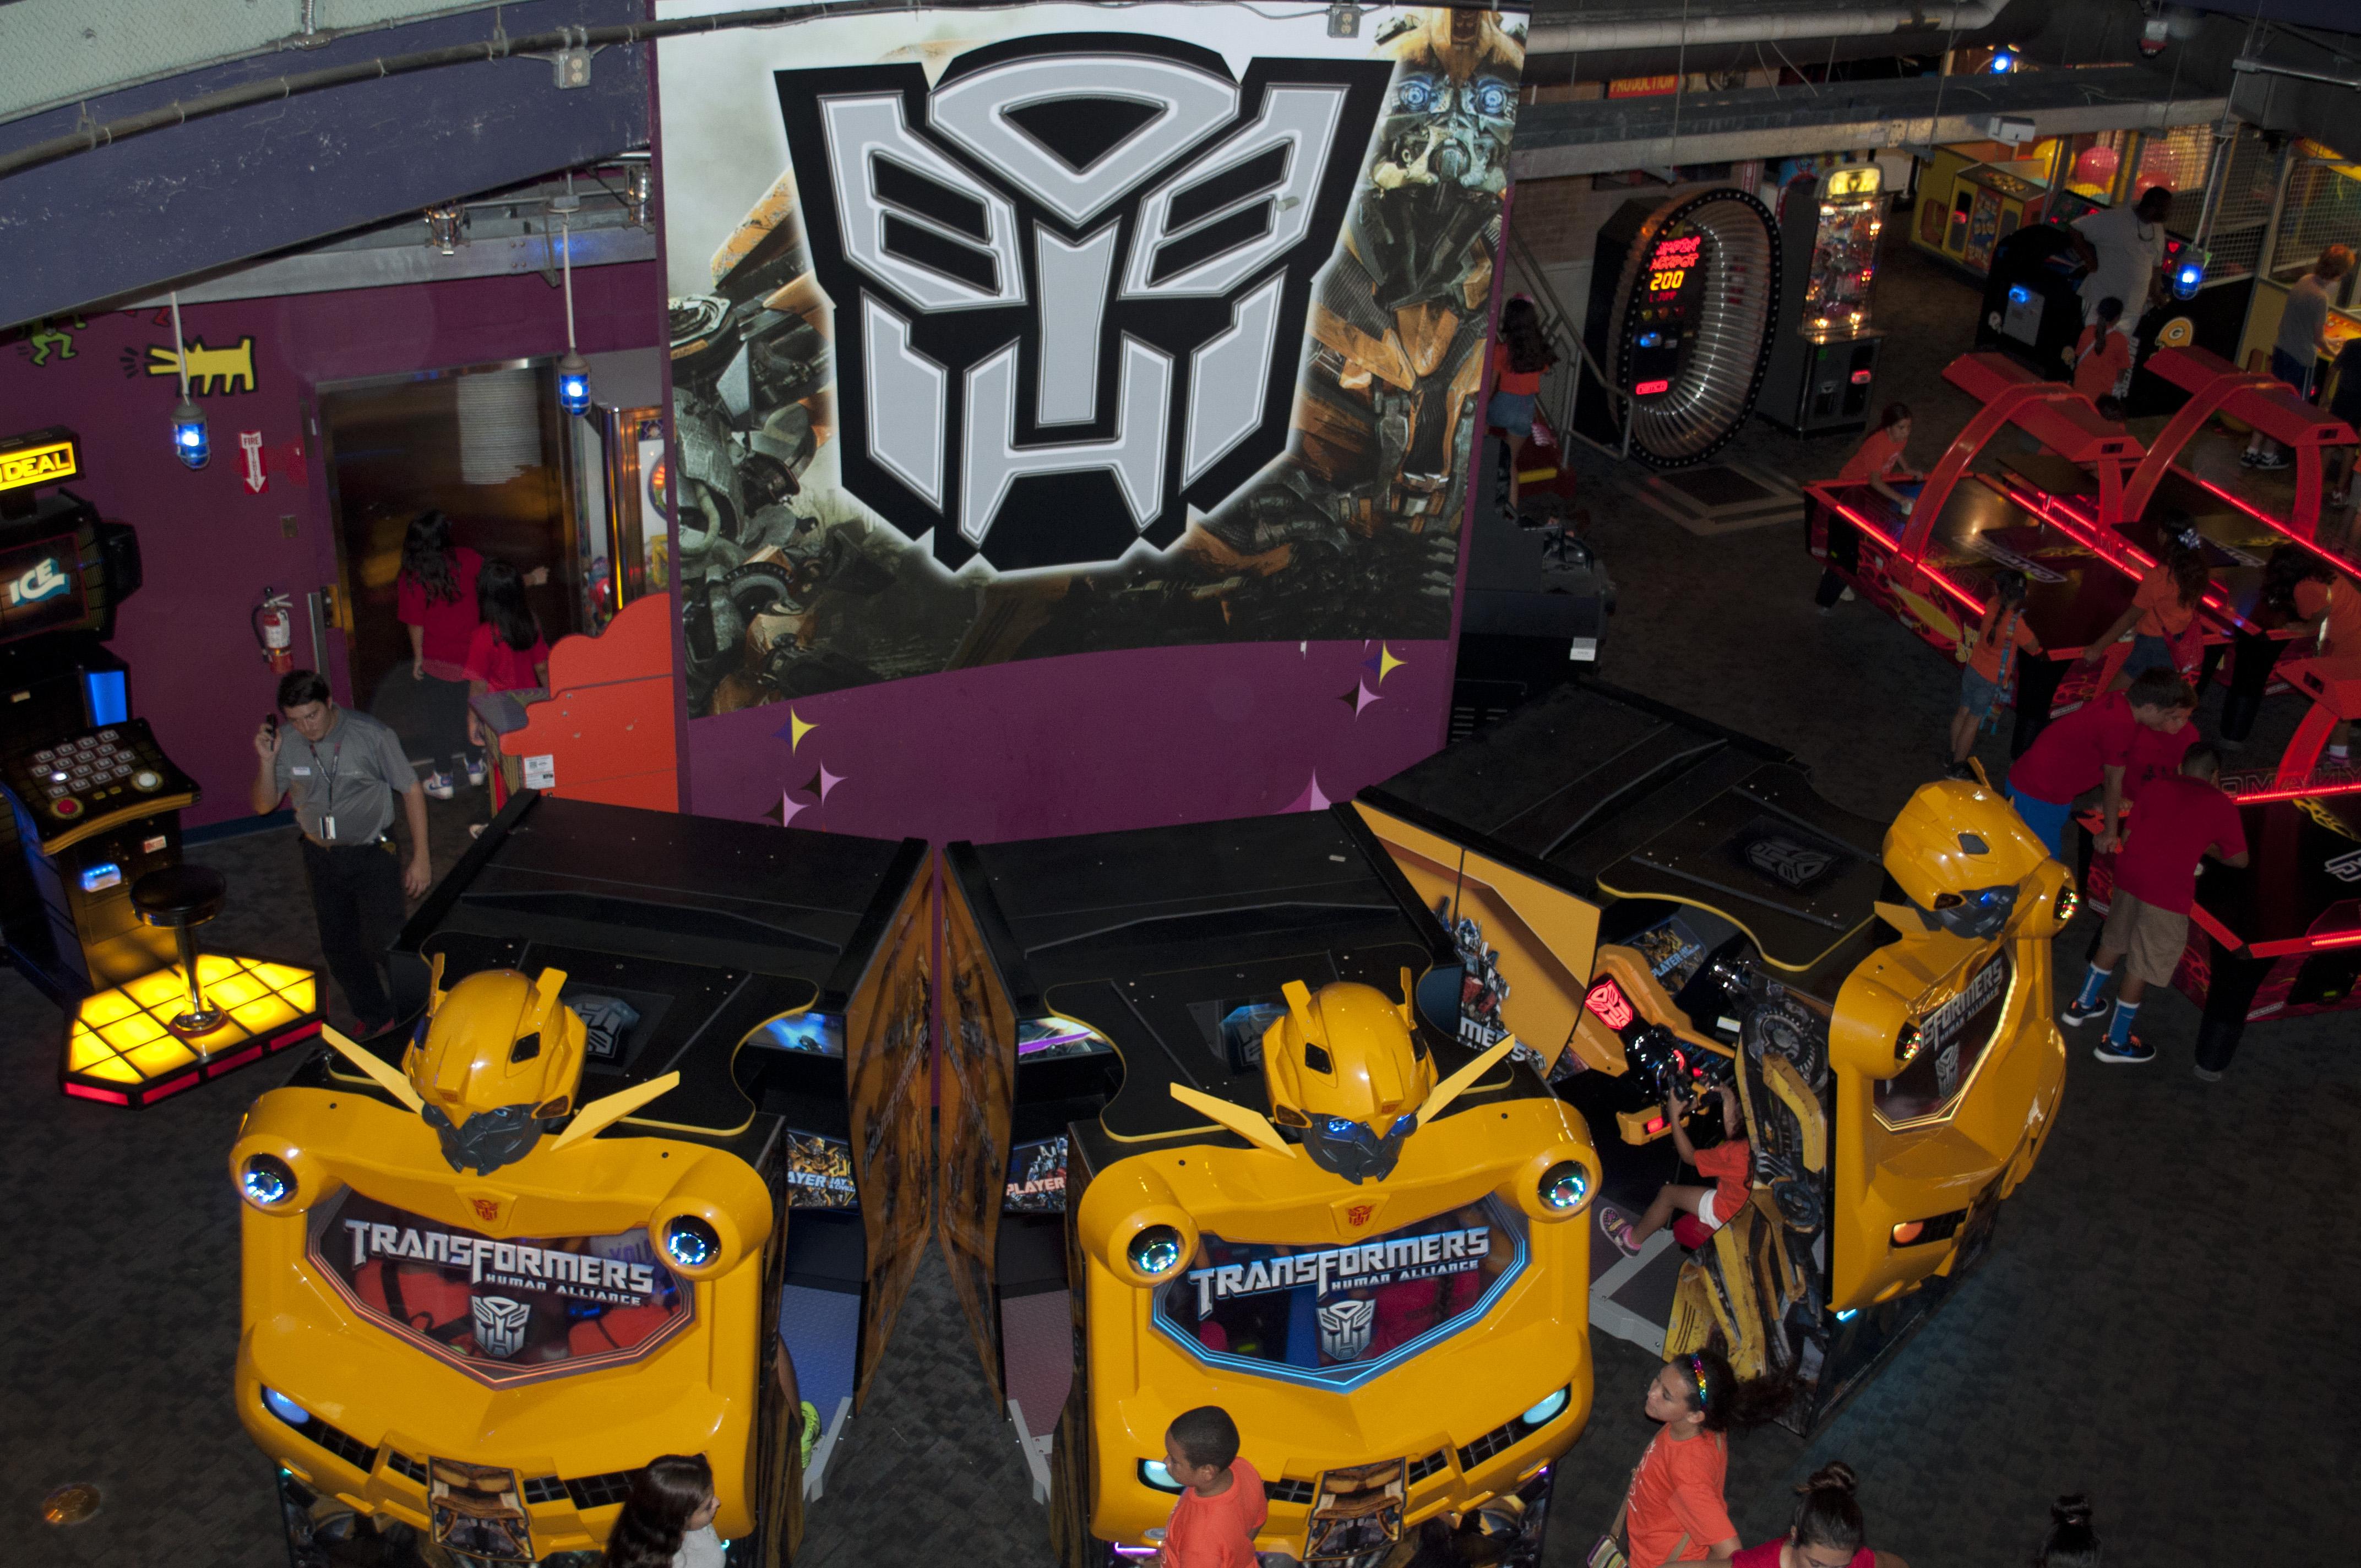 "Transformers: Human Alliance 55"" Theatre Arcade Machine by Sega ..."